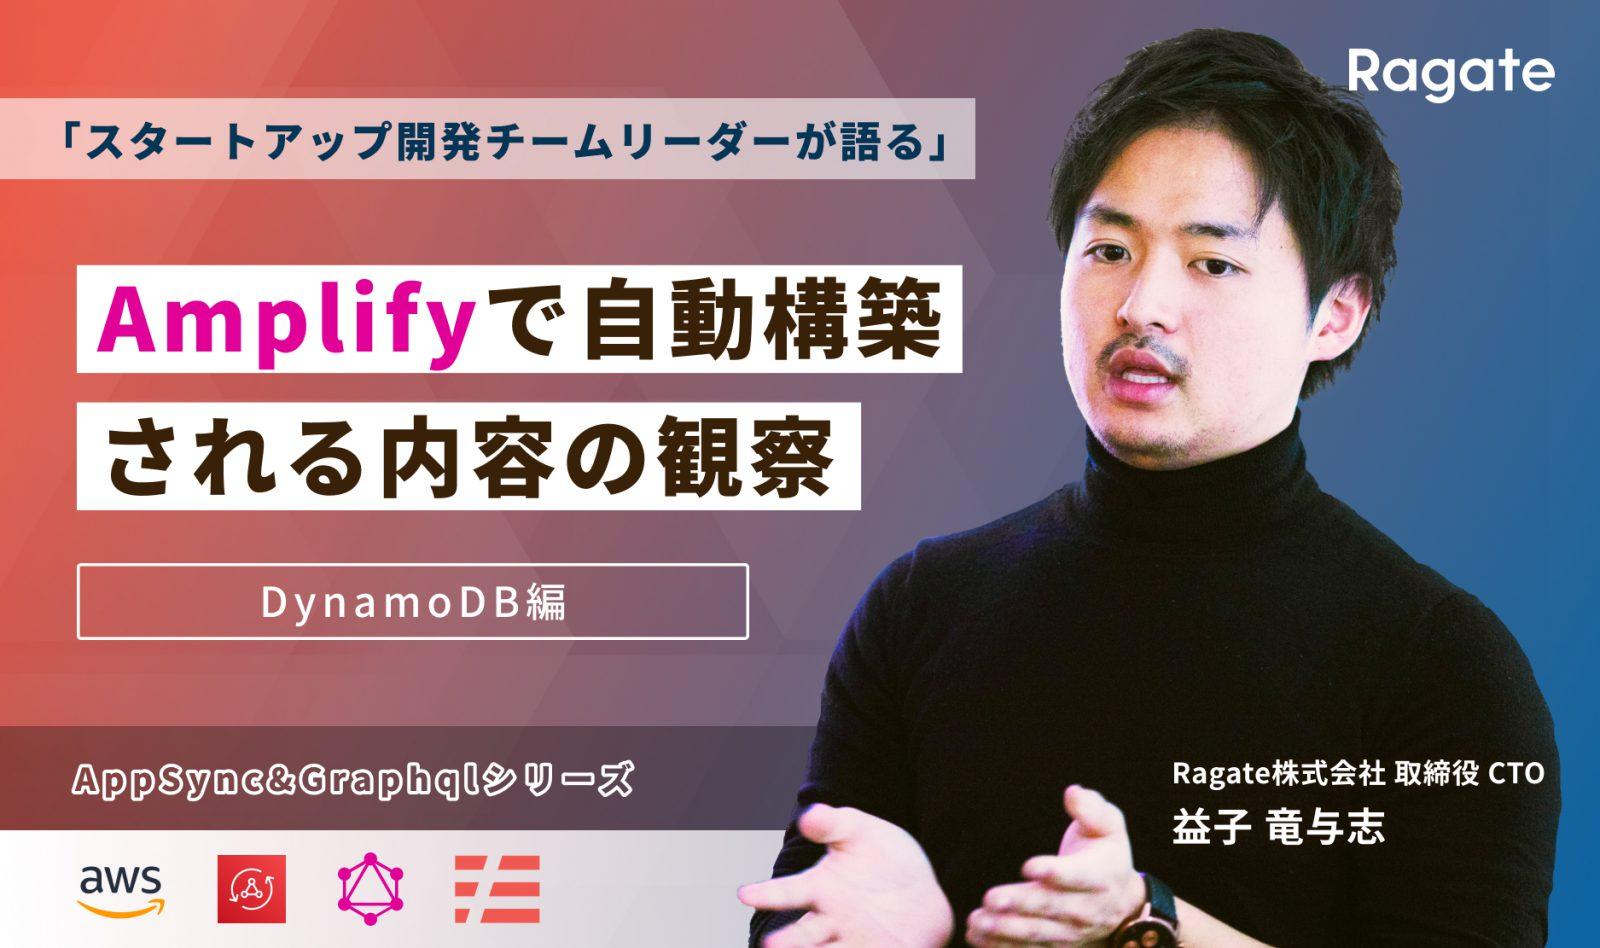 Amplifyで自動構築される内容の観察:DynamoDB編